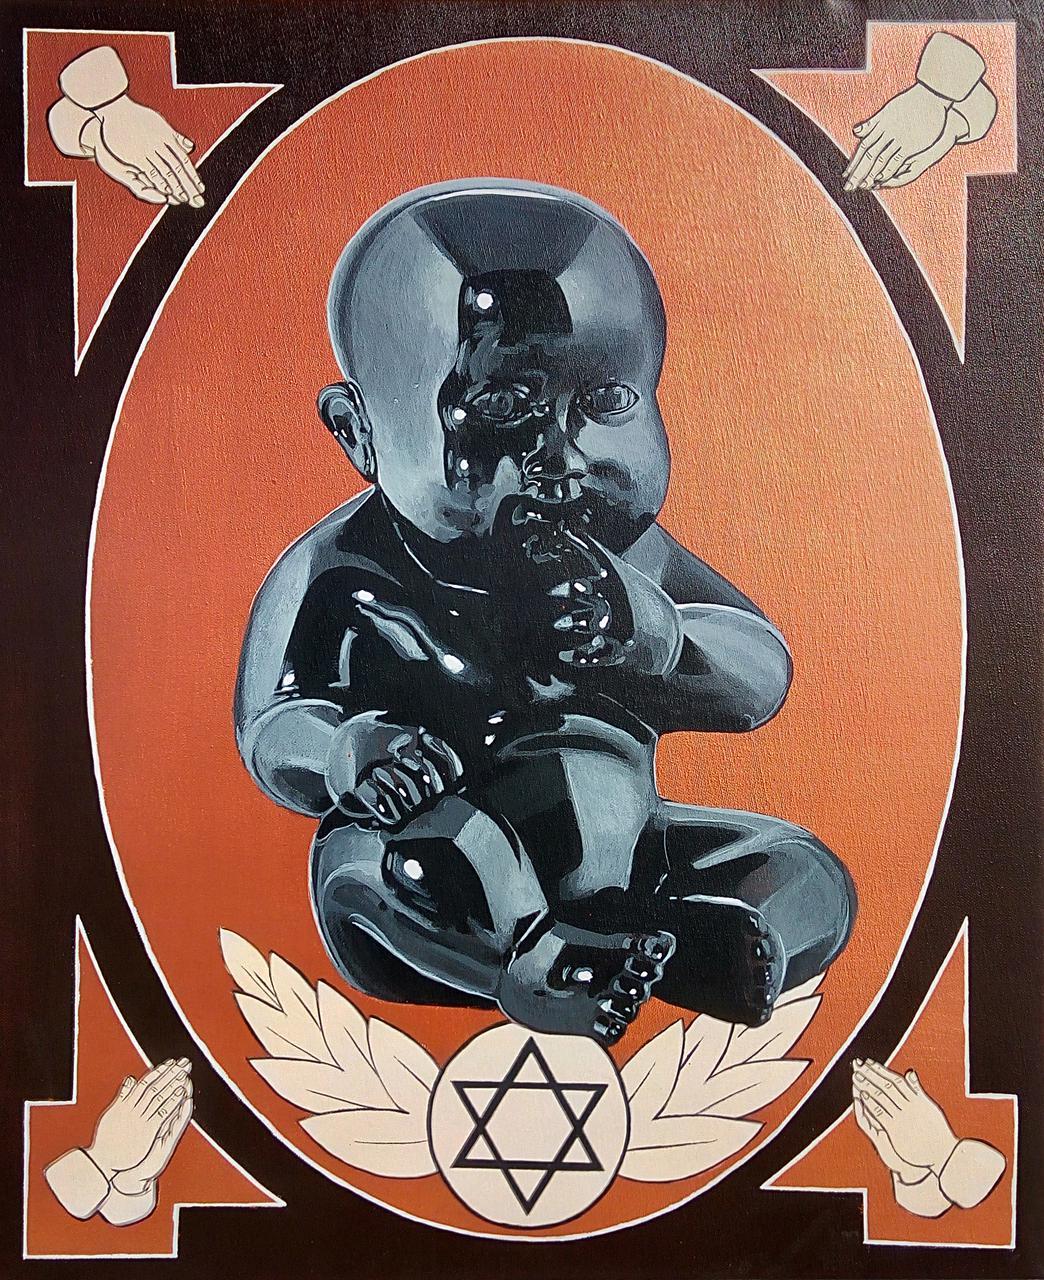 Genesis, acrylic on canvas, 50 x 60 cm